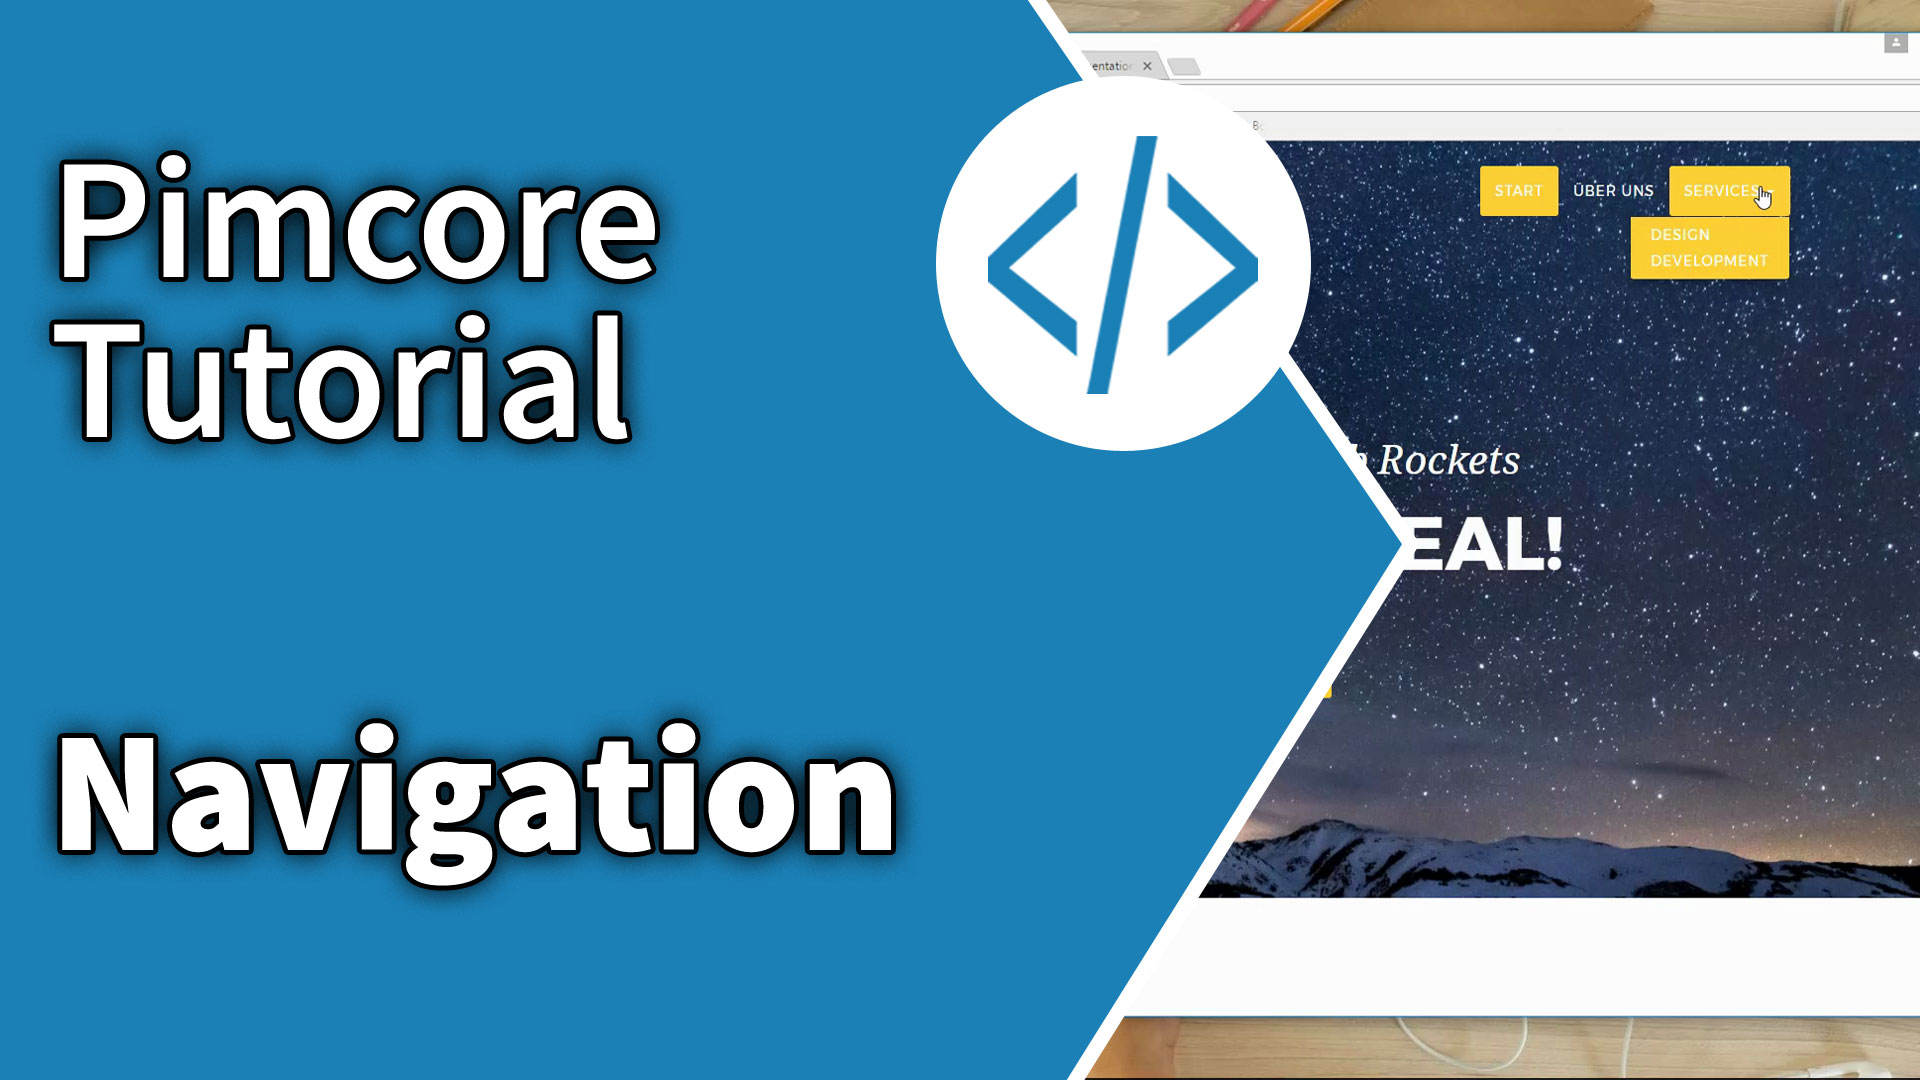 Pimcore Tutorial: Navigation